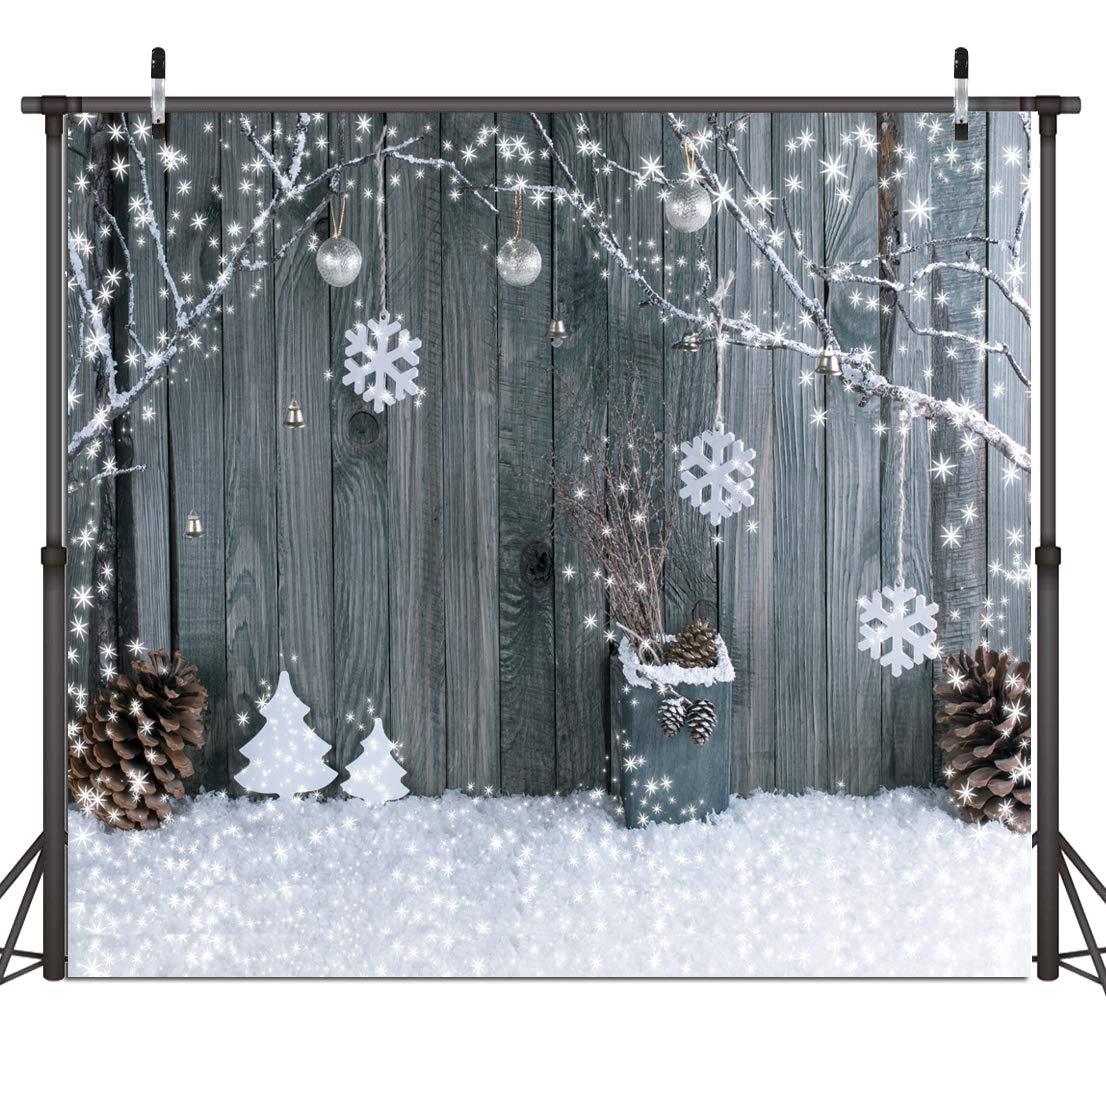 Dudaadcvt 7x5ft Vinyl Christmas Backdrops Photography Vintage Christmas Fireplace Photo Backdrops Customized Photo Background Studio Props D0320705